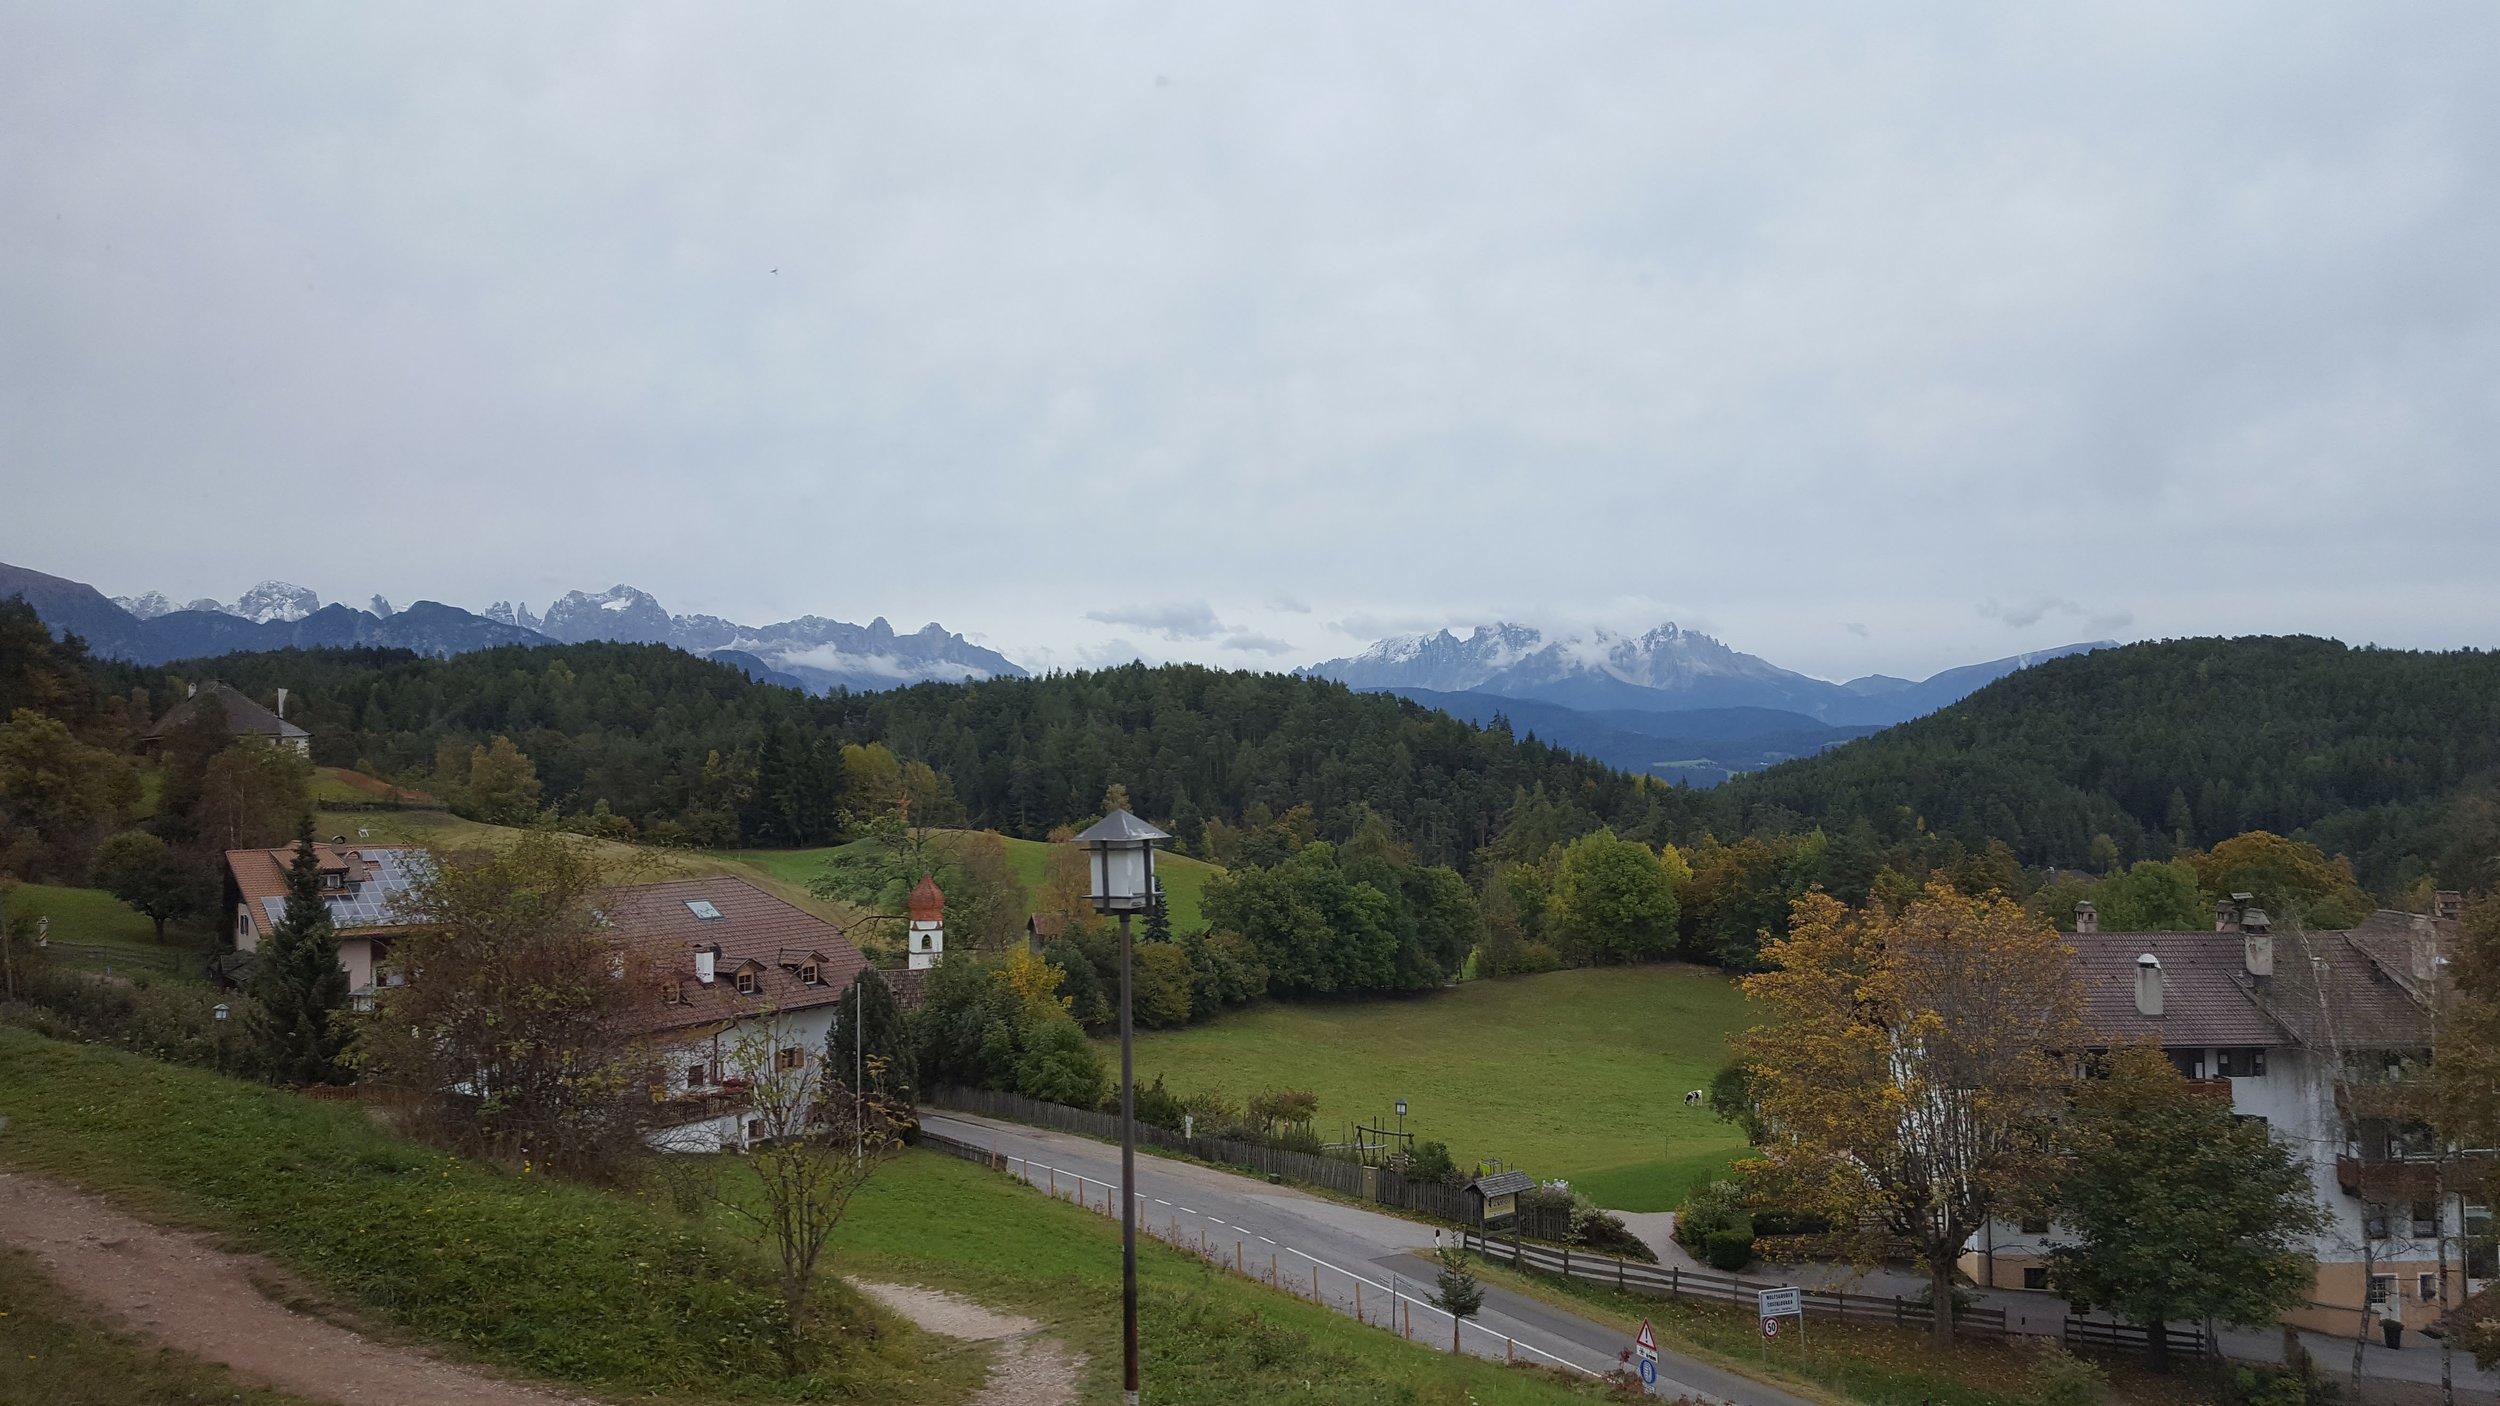 View of the Dolomites from Soprabolzano